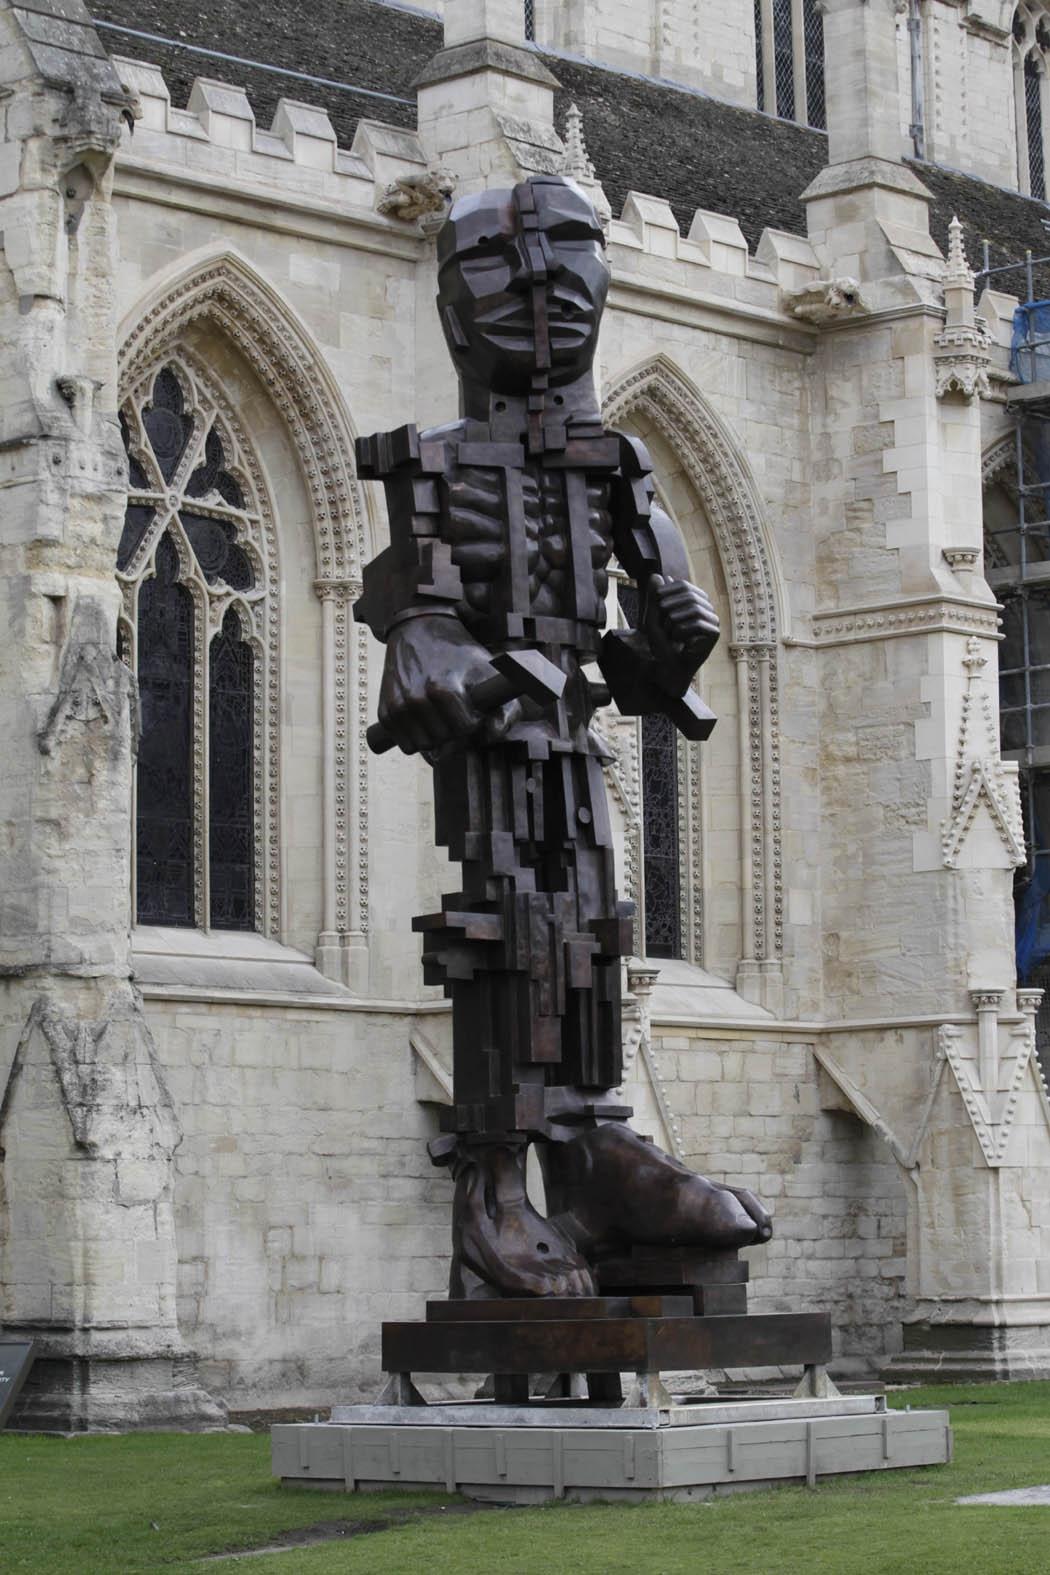 Monumental 'Bronze' 'sculpture' by 'artist' Eduardo Paolozzi, 'cast' at Pangolin Editions